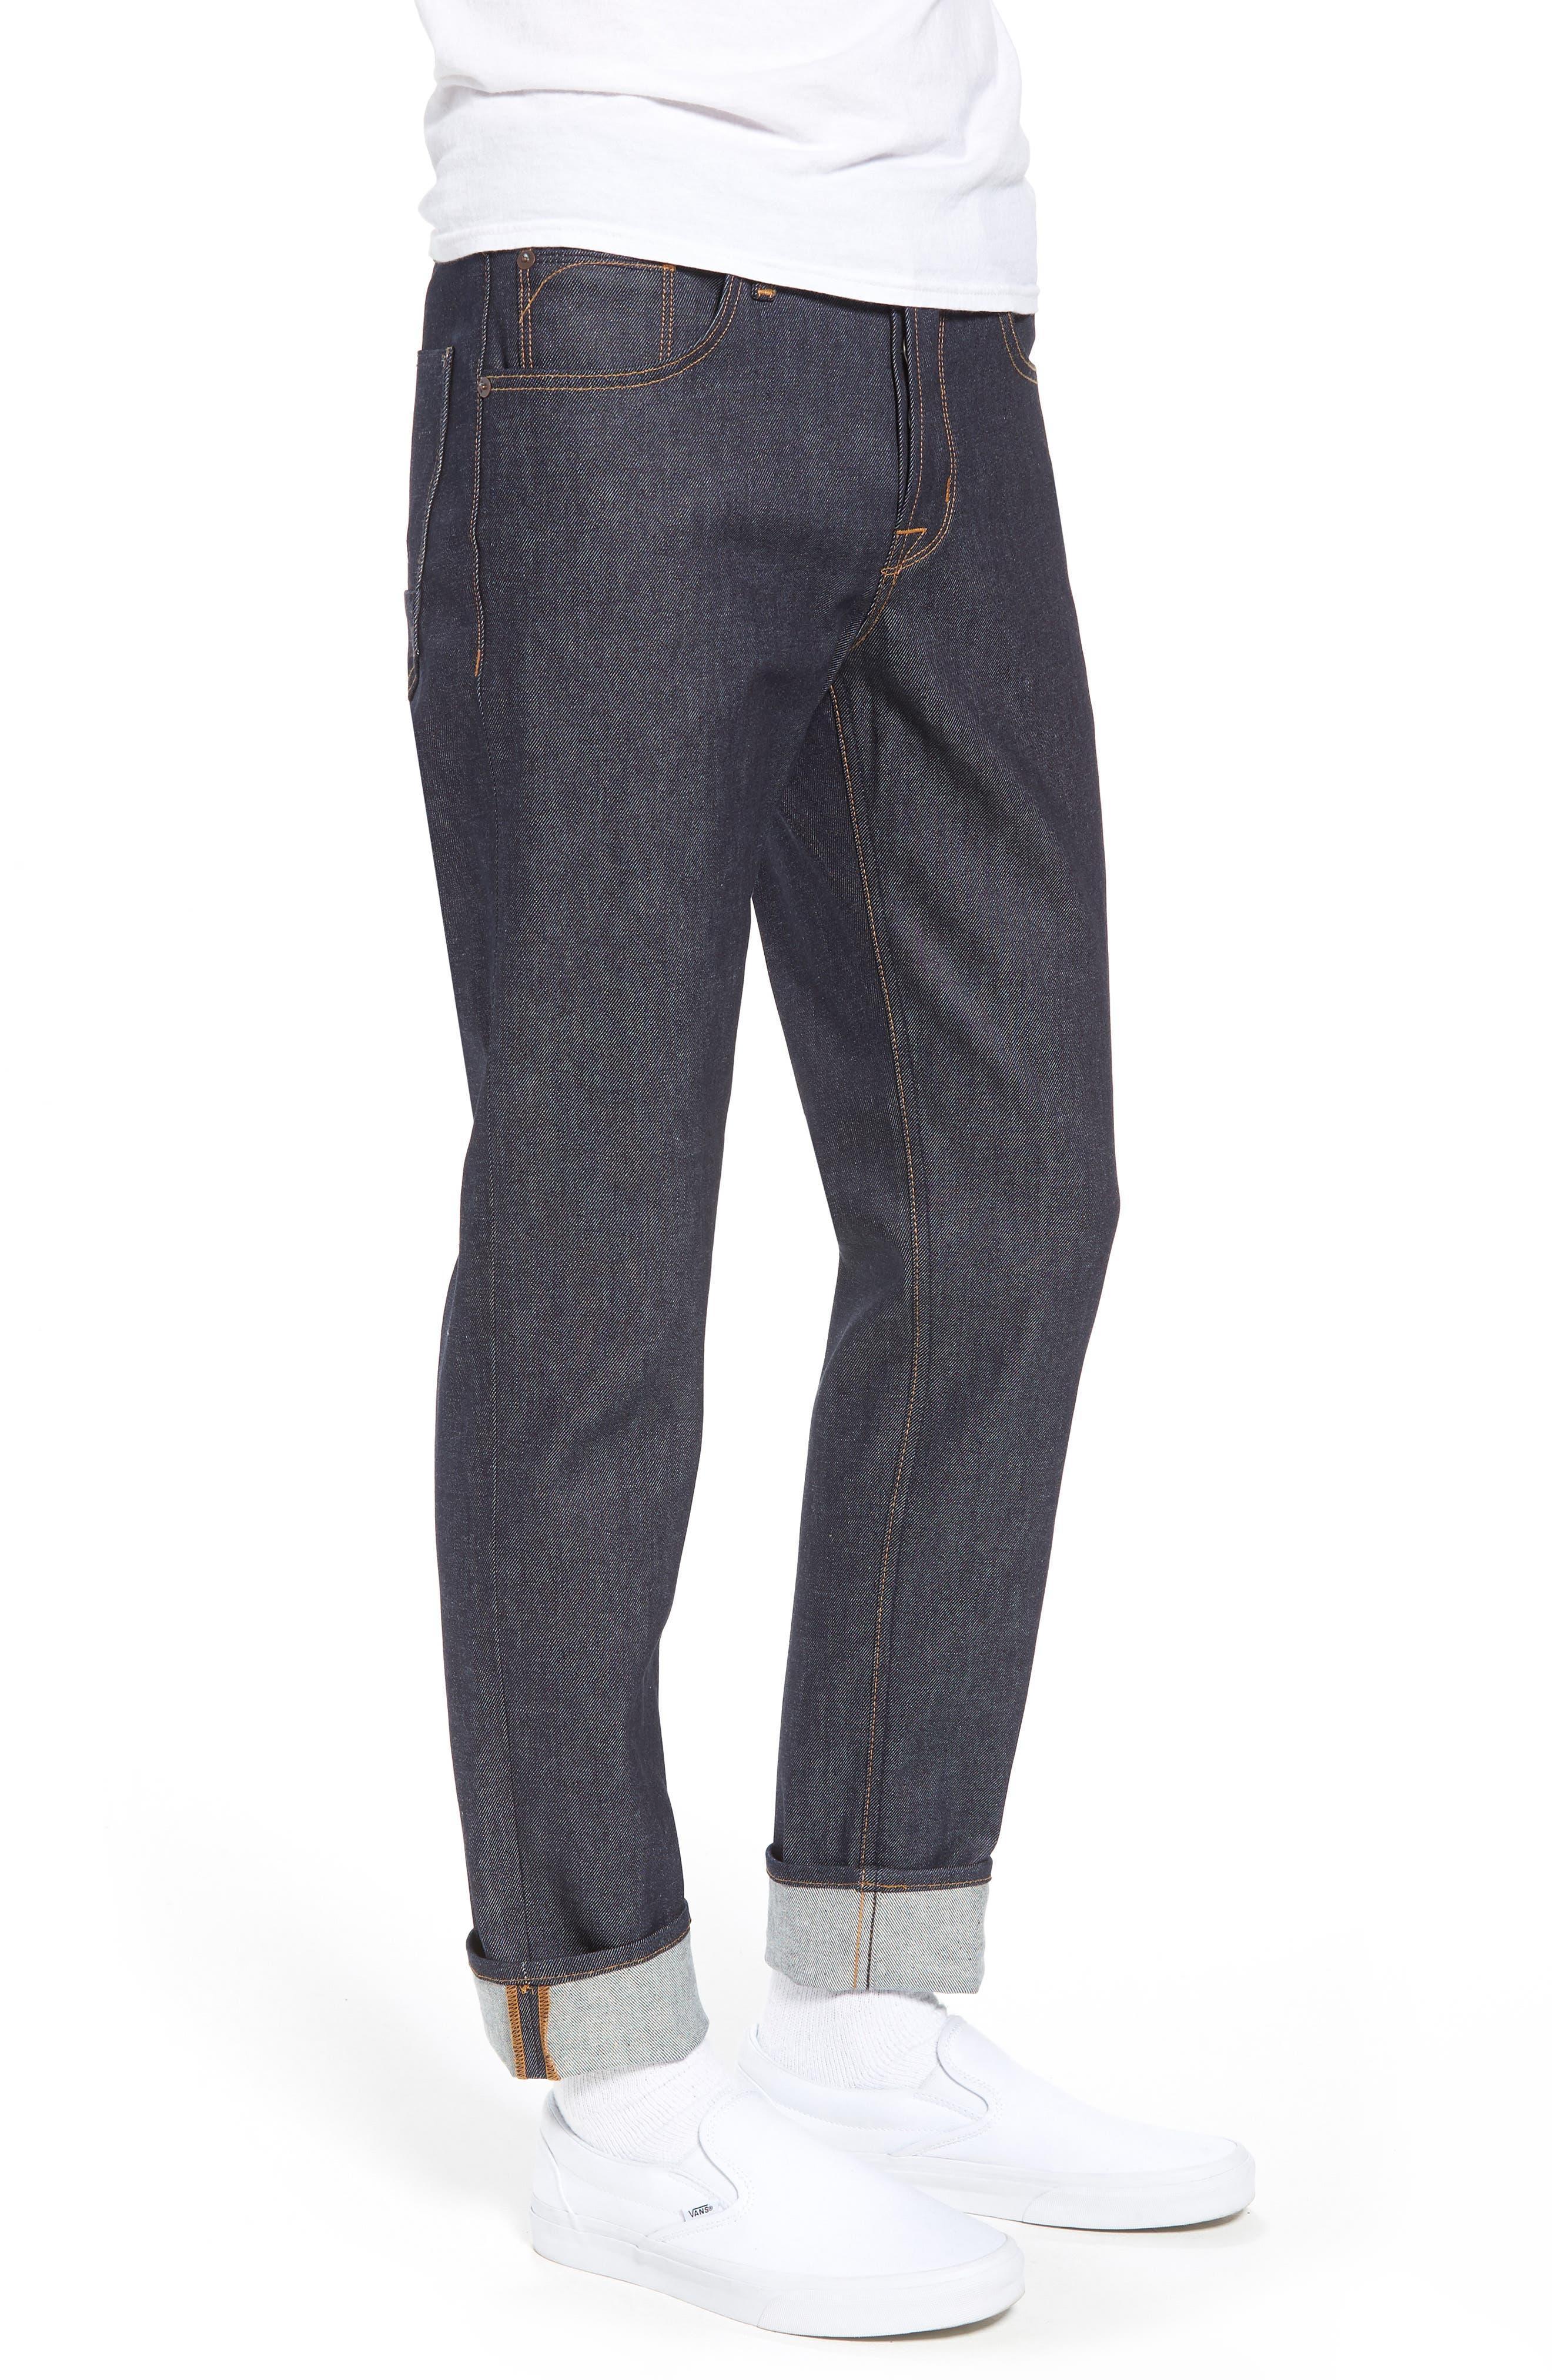 Sartor Skinny Fit Jeans,                             Alternate thumbnail 3, color,                             RAW